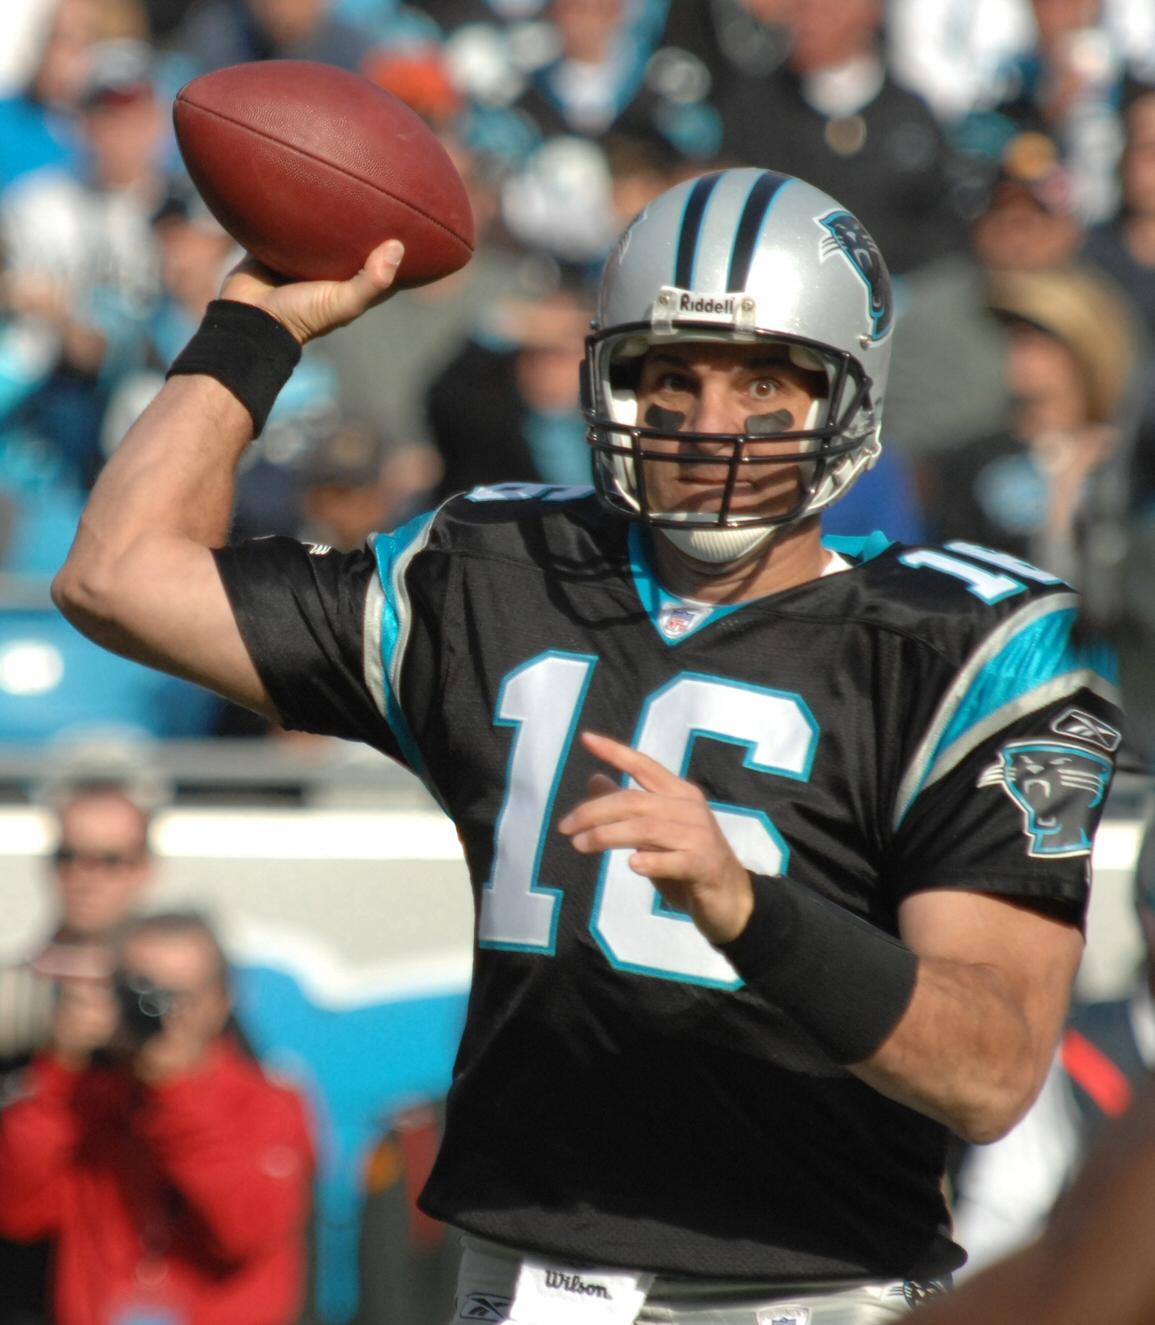 CHARLOTTE, N.C. -- Carolina Panthers quarterback, Vinny Testaverde, attempts a pass Nov. 11 against the Atlanta Falcons.  (U.S. Air Force photo/Staff Sgt. Henry Hoegen)